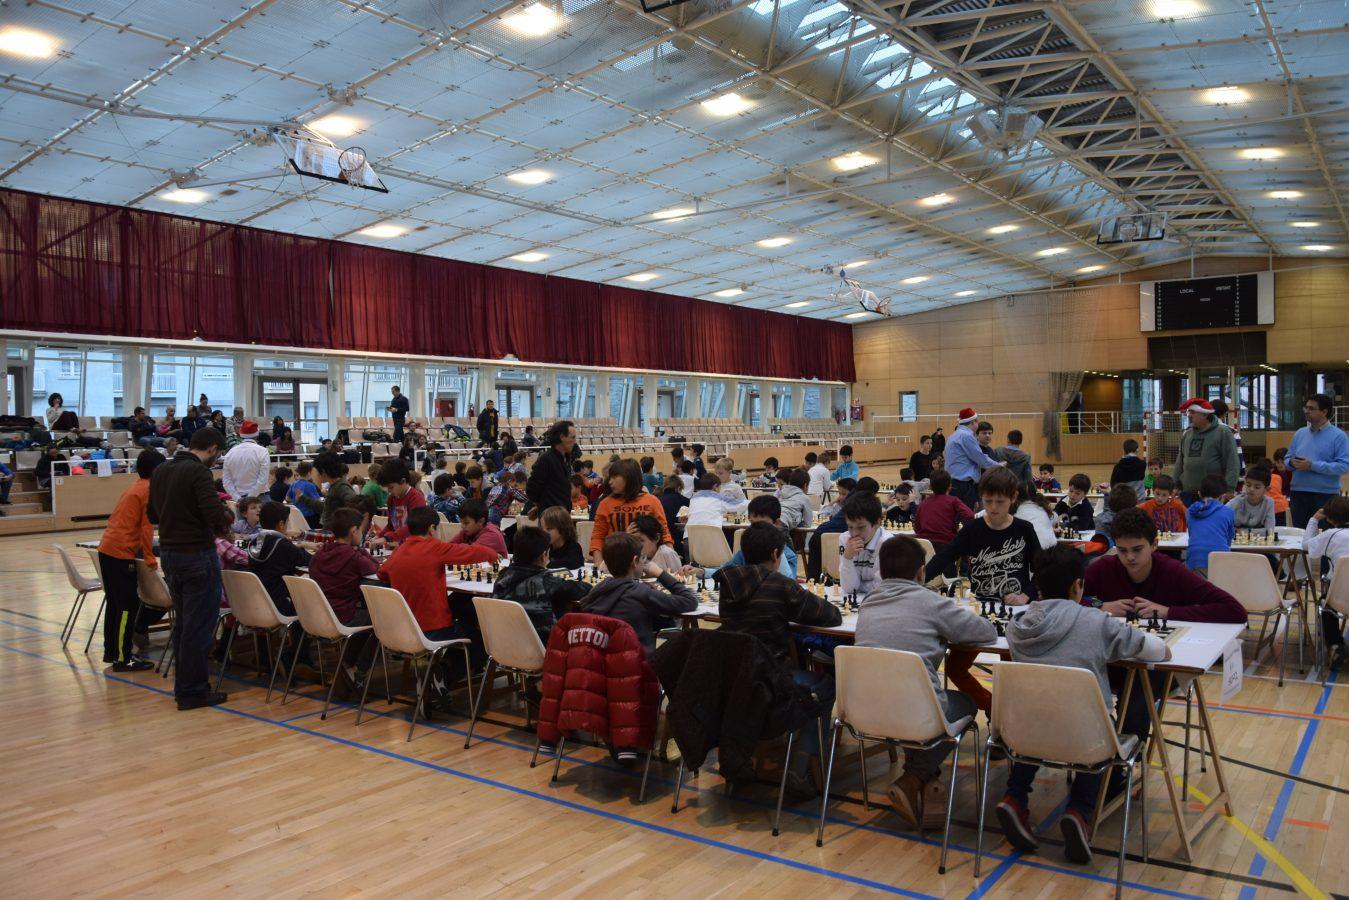 14è Festival Escolar de Nadal